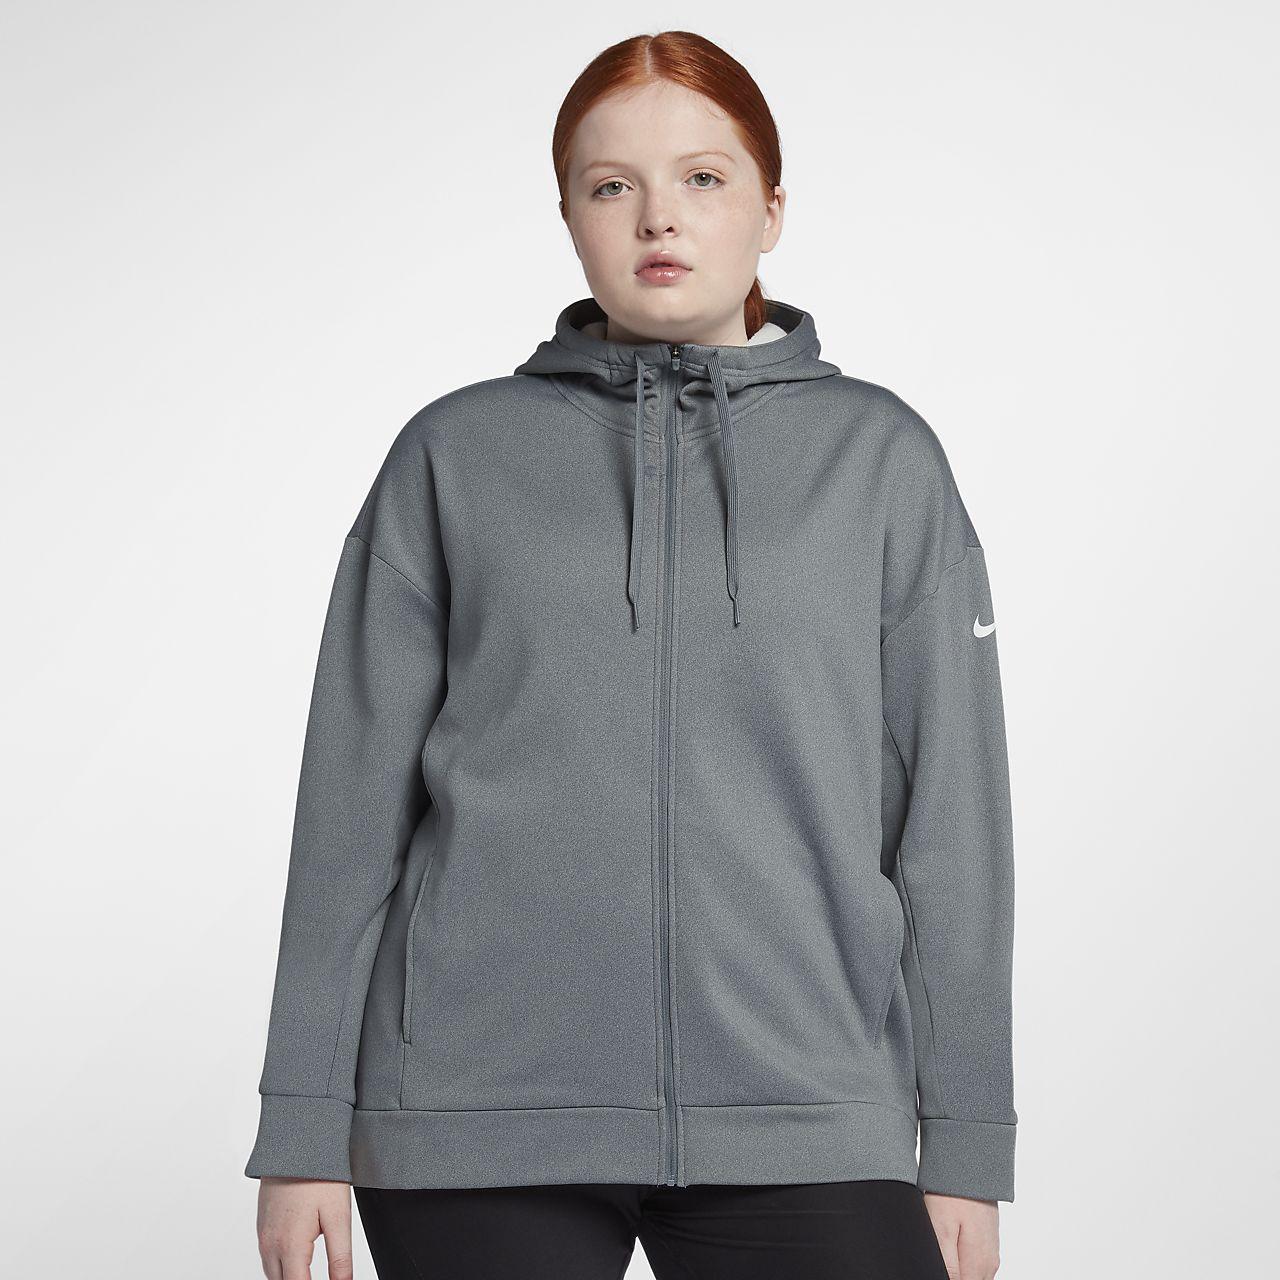 Nike Dri-FIT Therma Women's Full-Zip Training Hoodie (Plus Size)